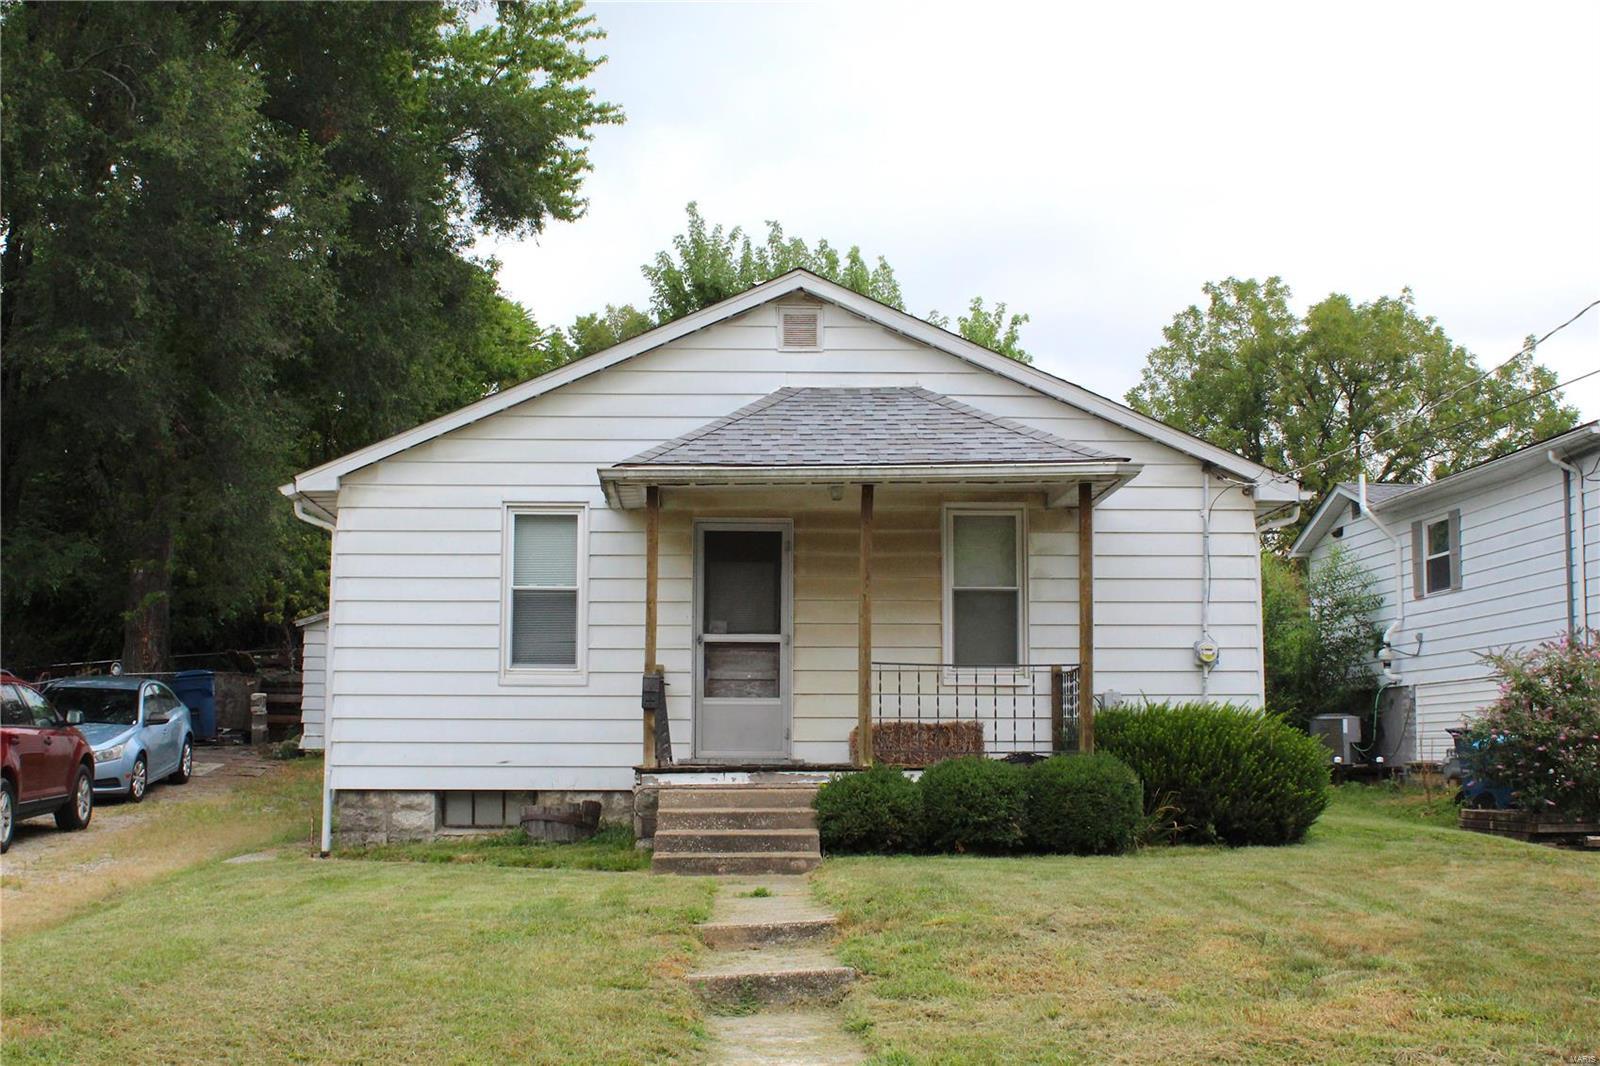 3710 Coronado Property Photo - Alton, IL real estate listing